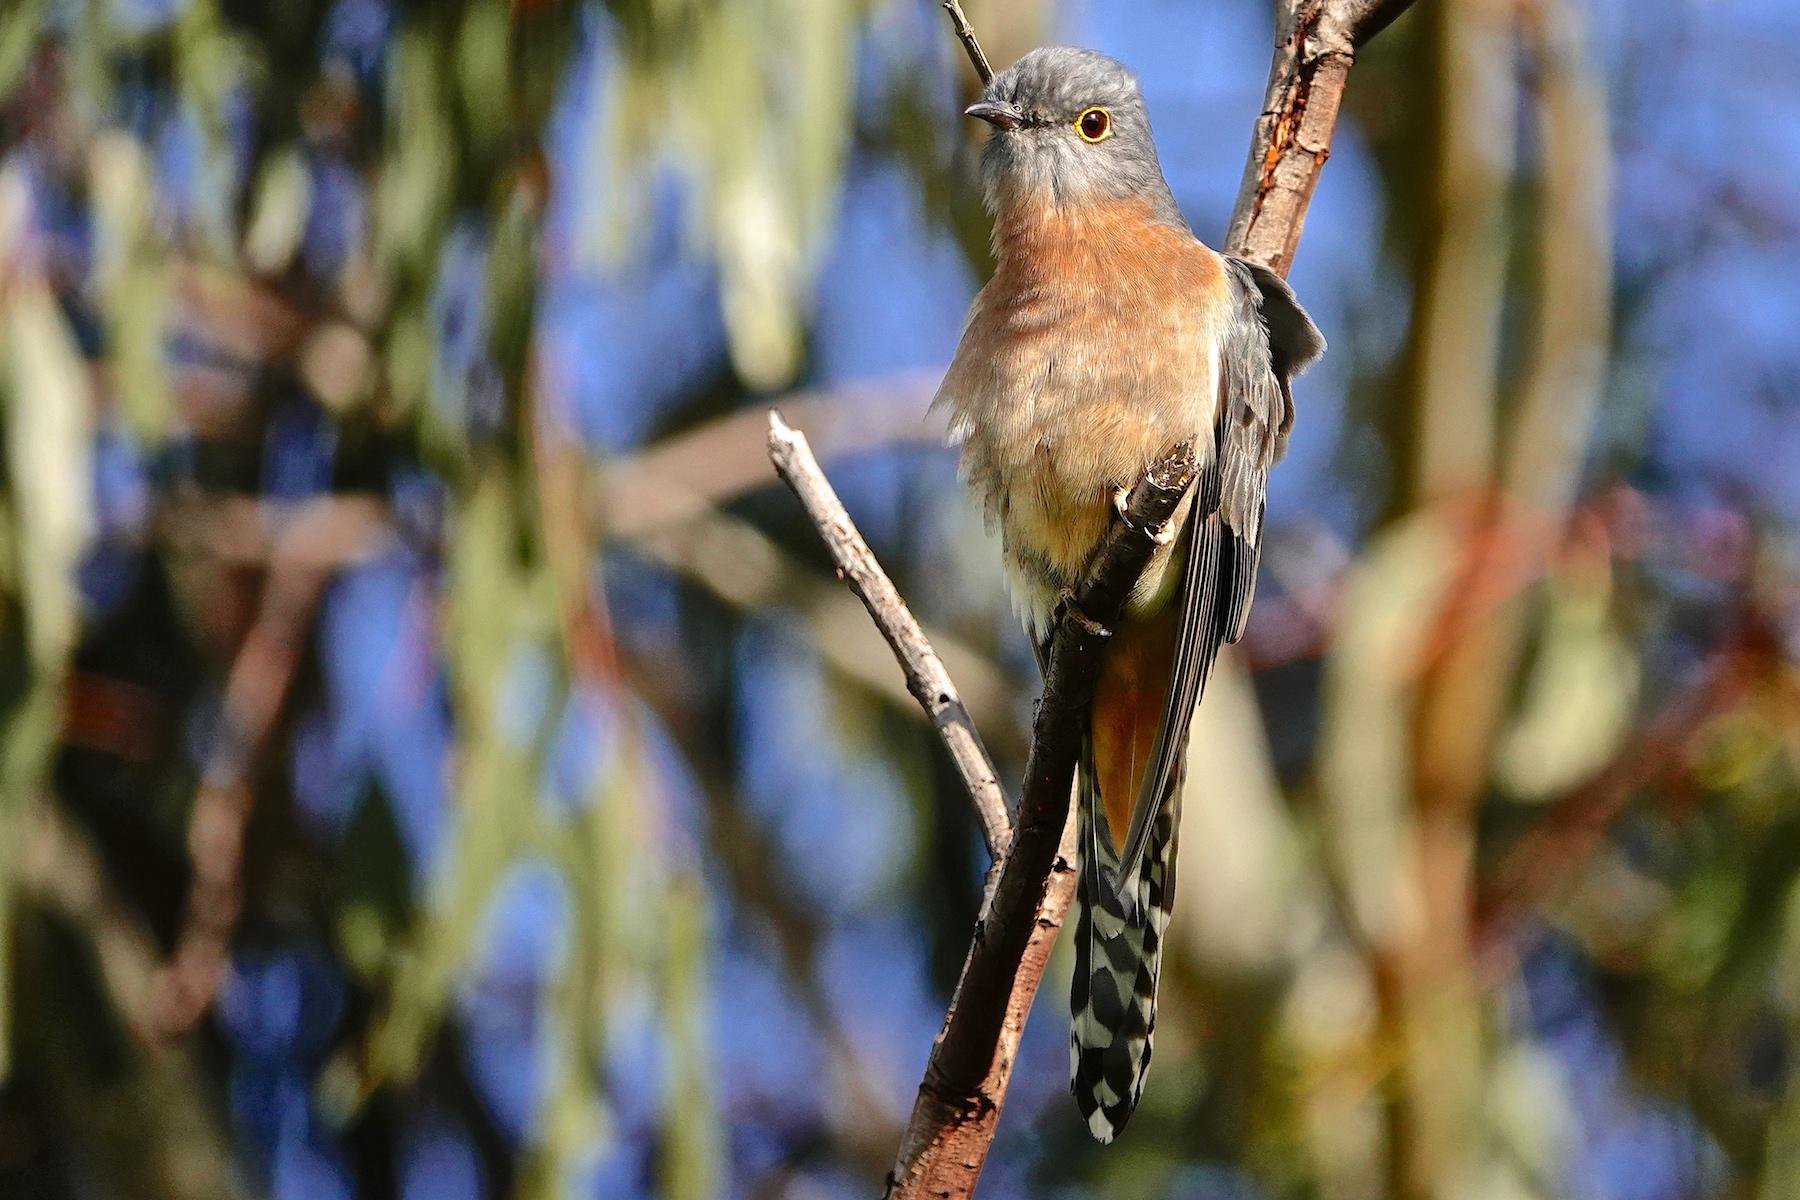 Fan-tailed Cuckoo (Image ID 40534)